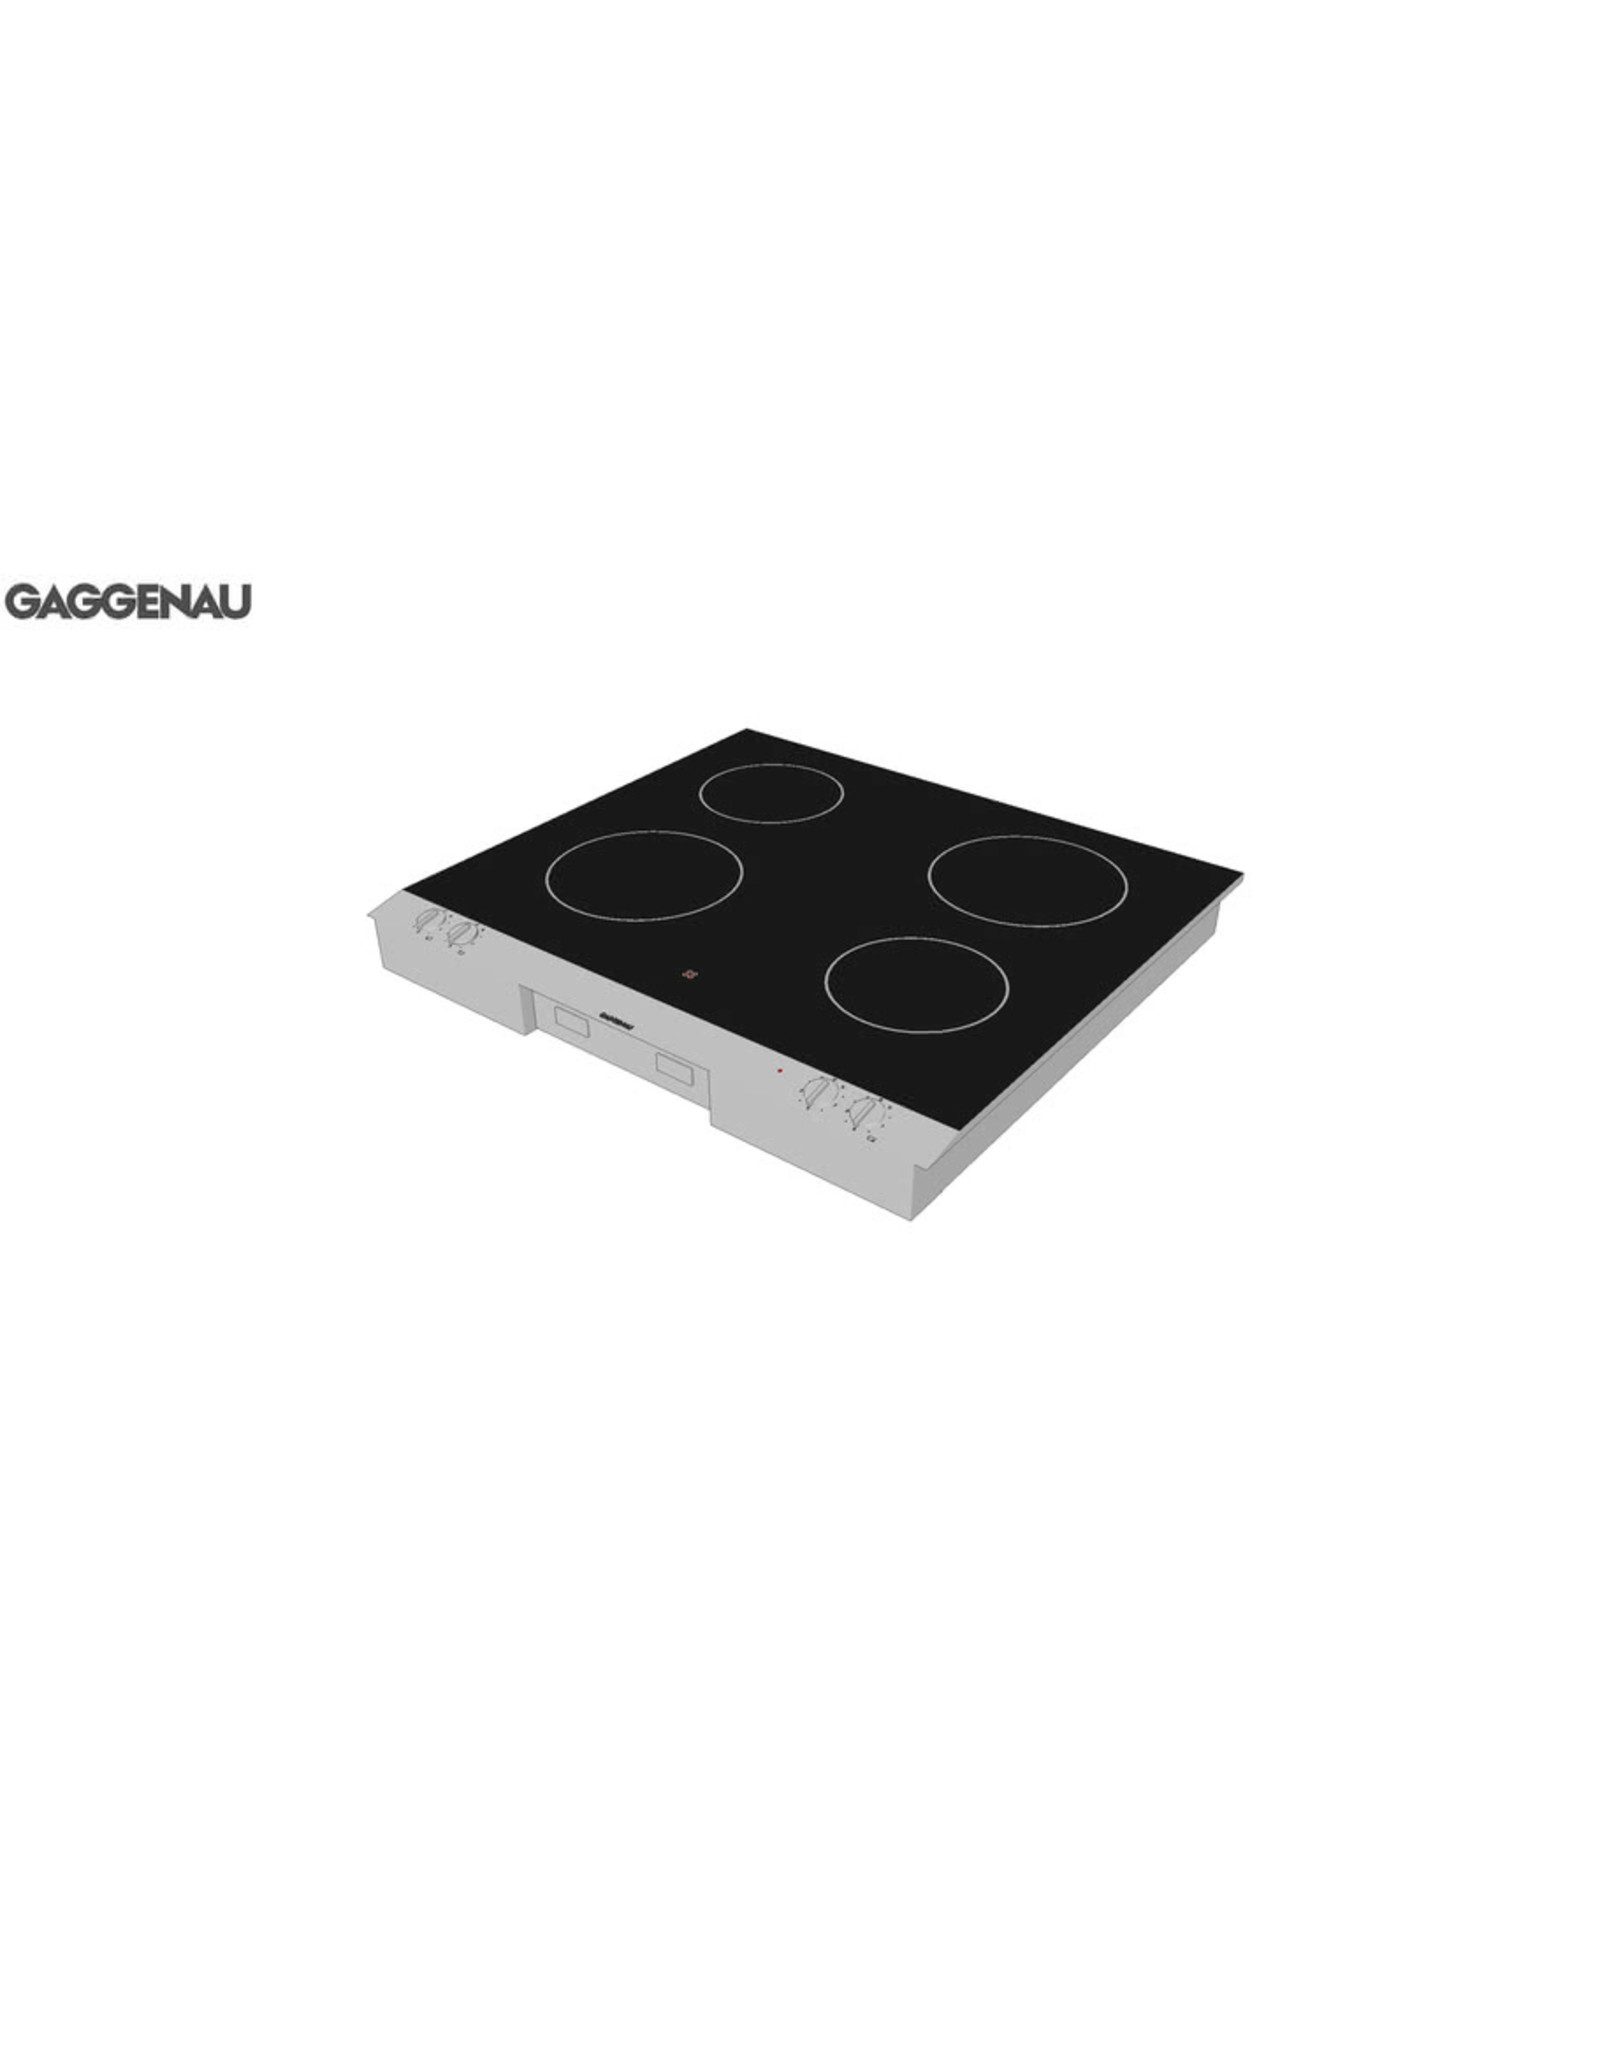 "Gaggenau GAGGENAU Vario Electric Cooktop 24"""